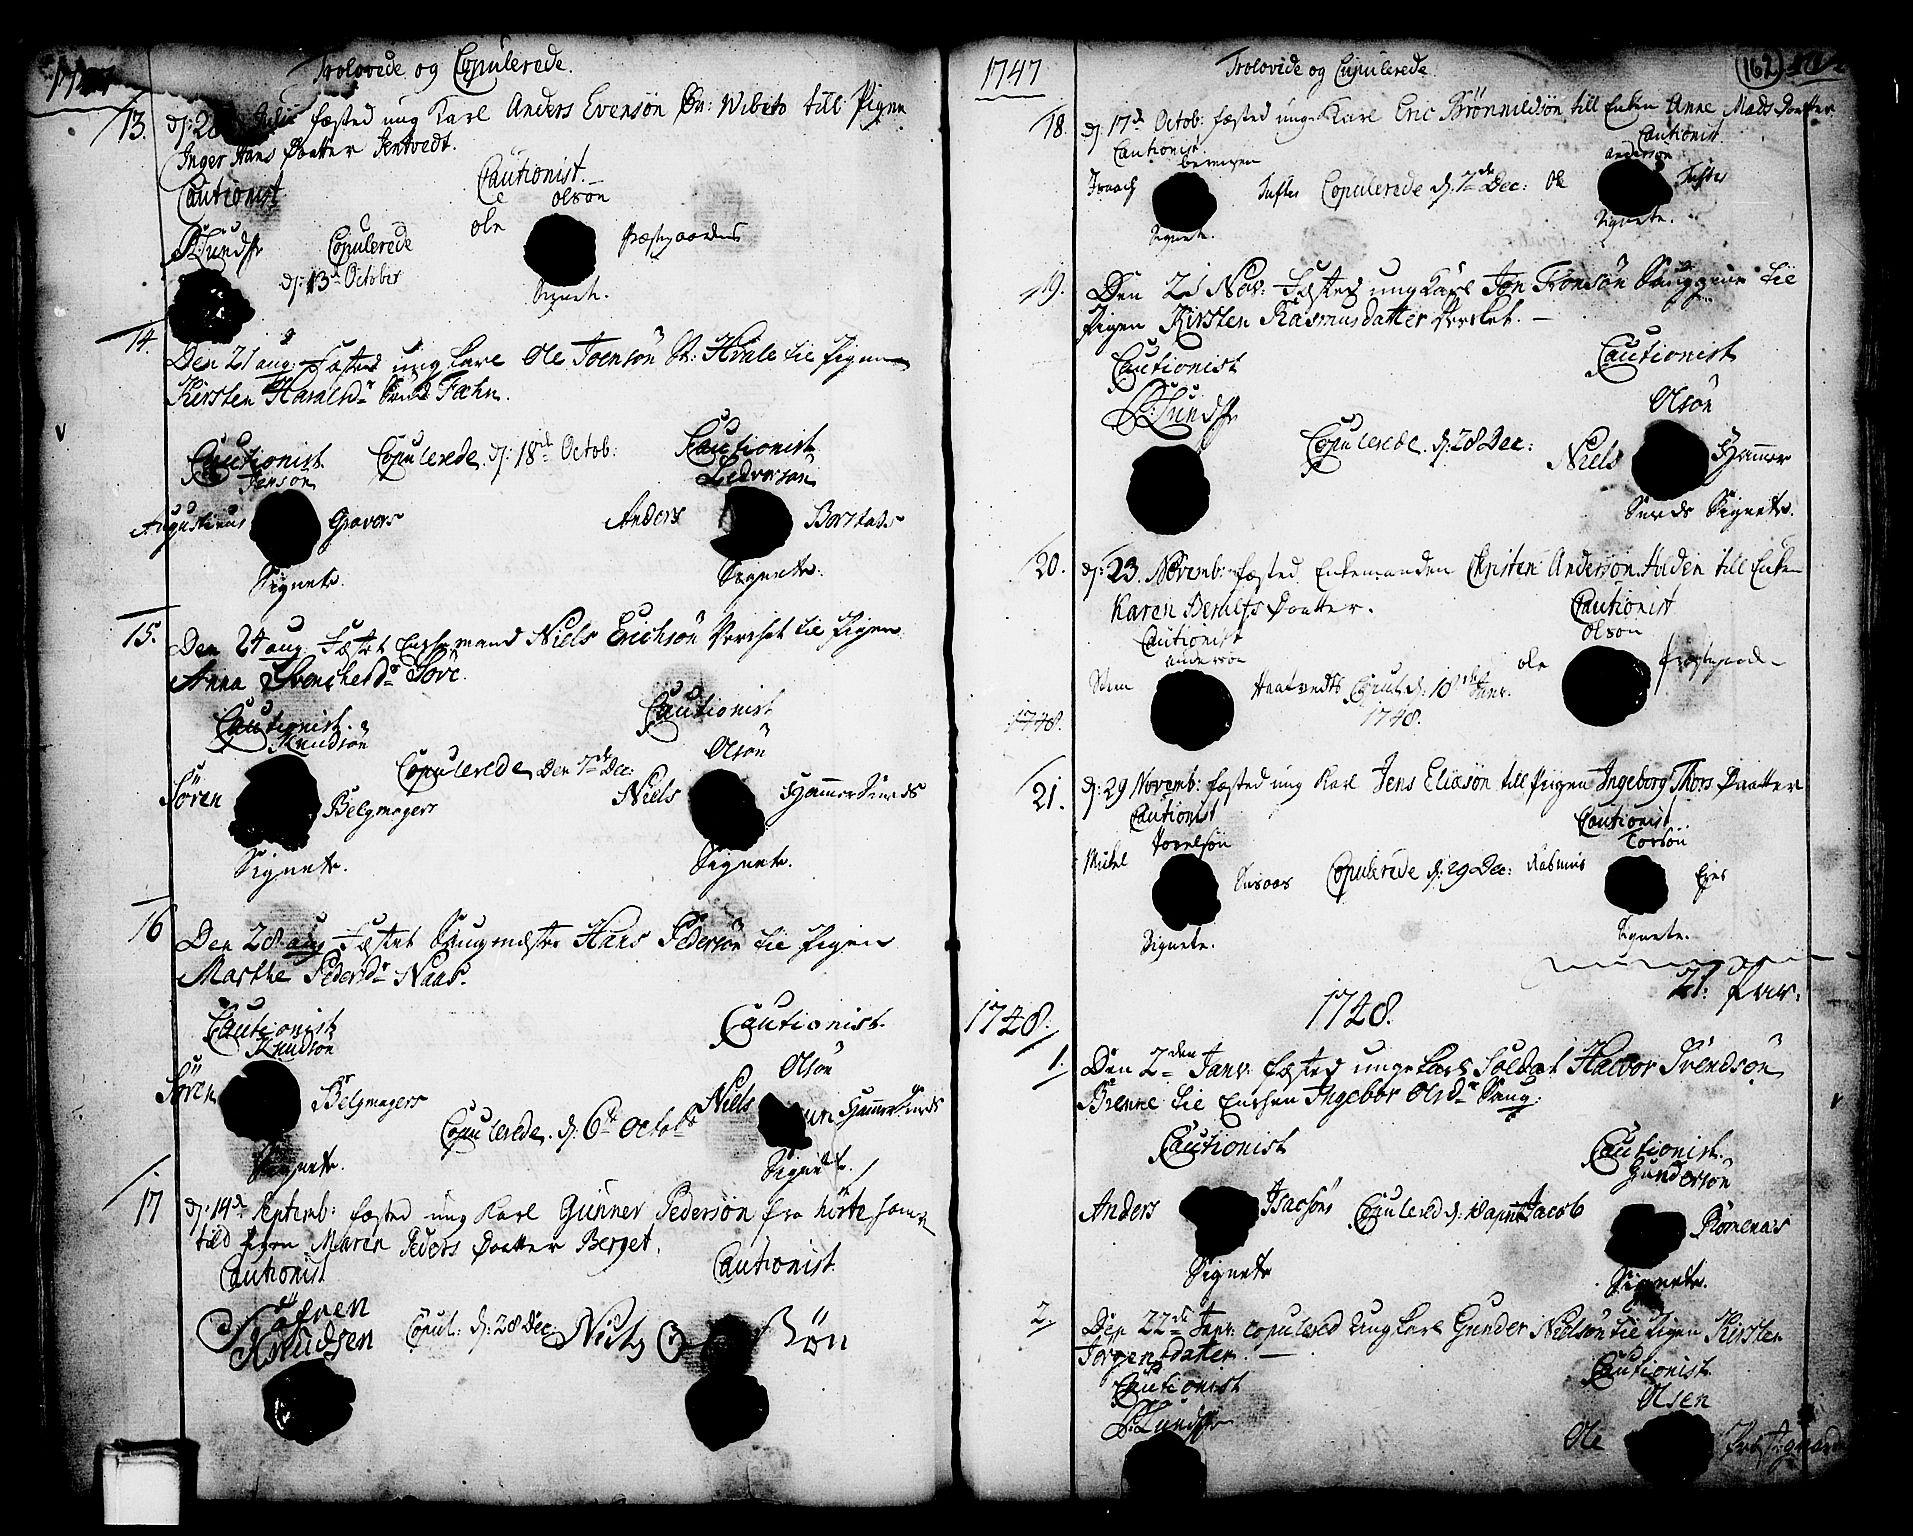 SAKO, Holla kirkebøker, F/Fa/L0001: Ministerialbok nr. 1, 1717-1779, s. 162